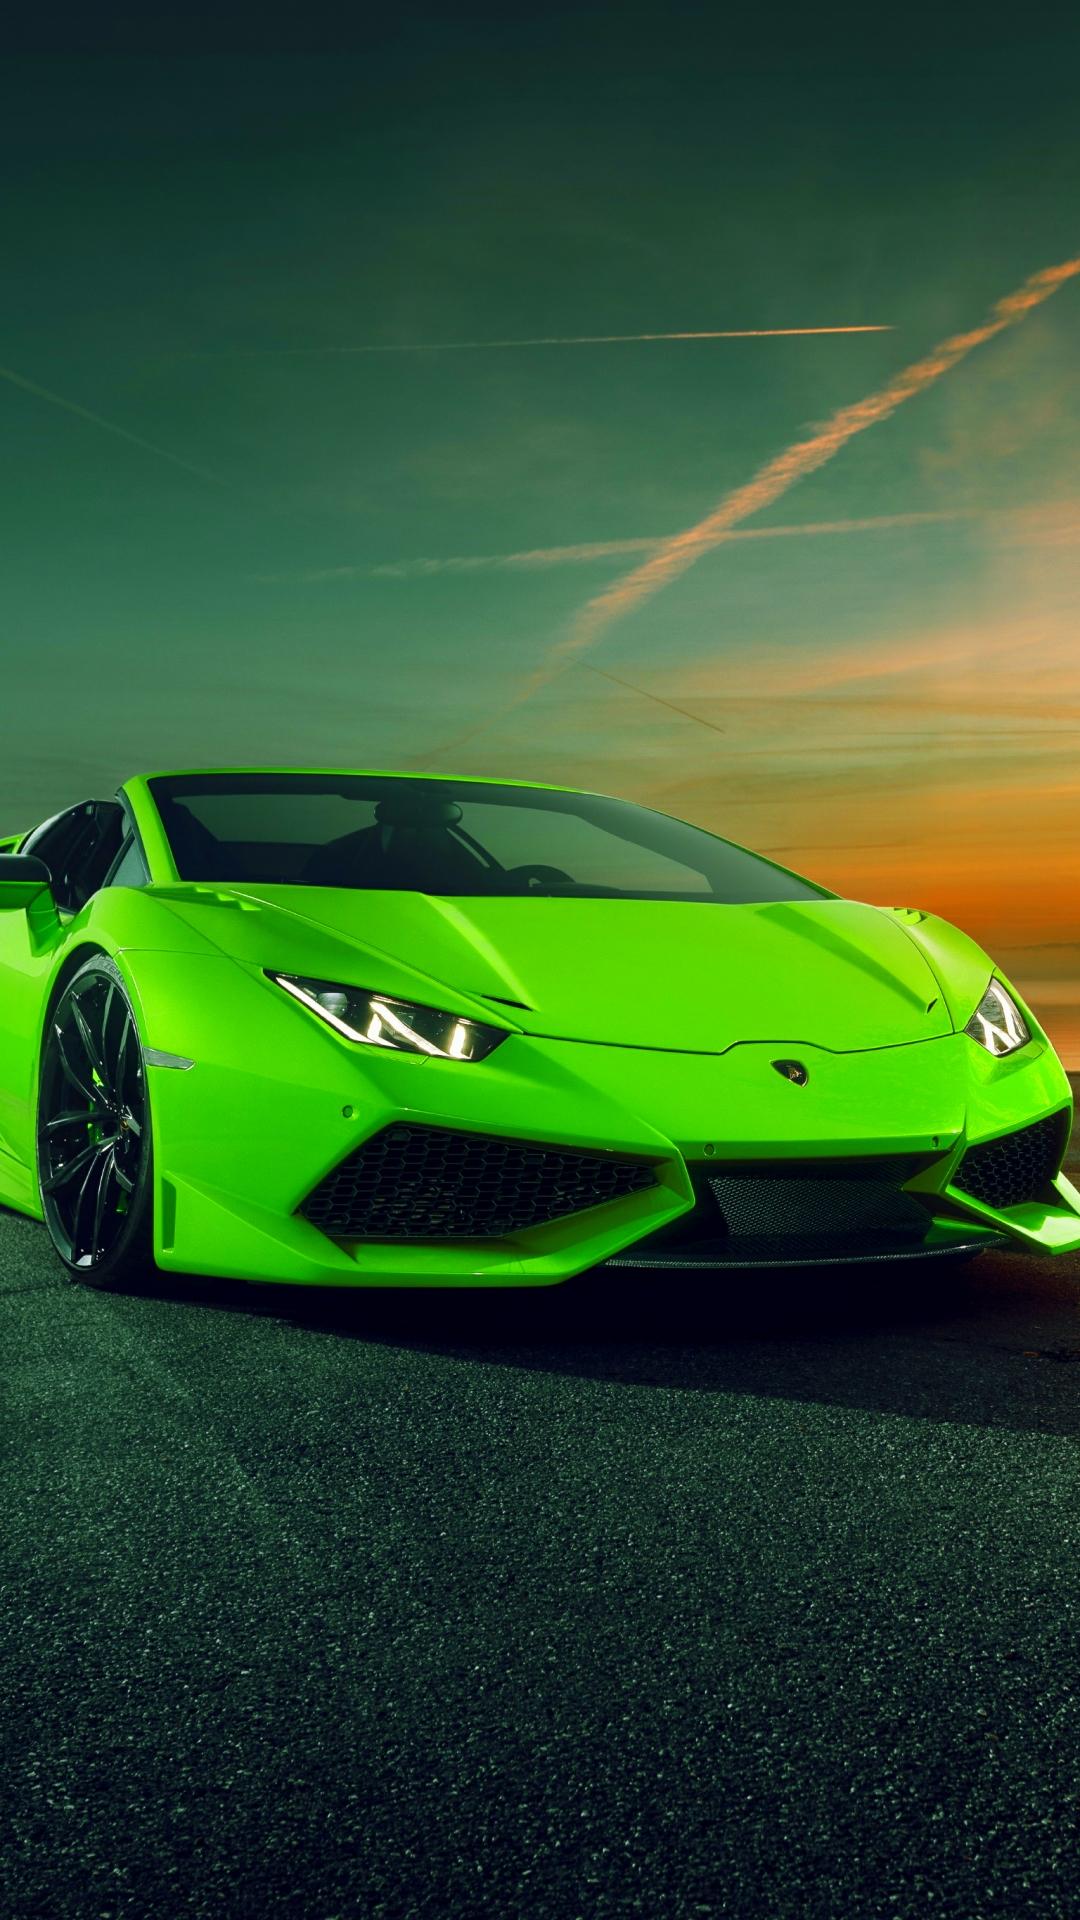 Vehicles Lamborghini Huracan 1080x1920 Wallpaper Id